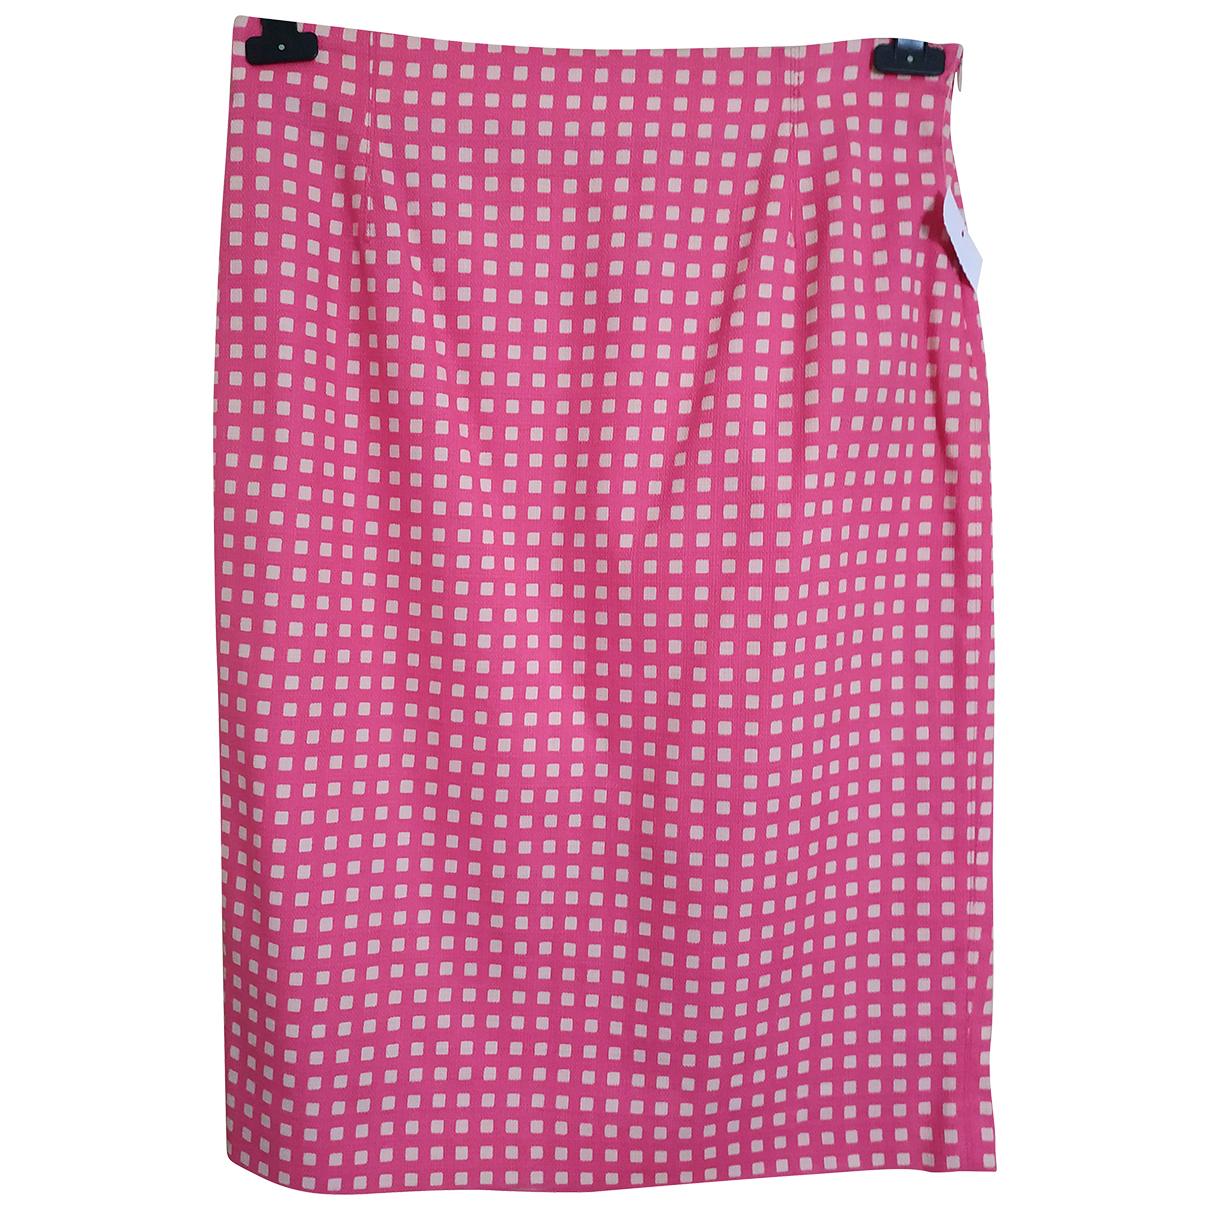 Max Mara N Multicolour Cotton skirt for Women 48 IT